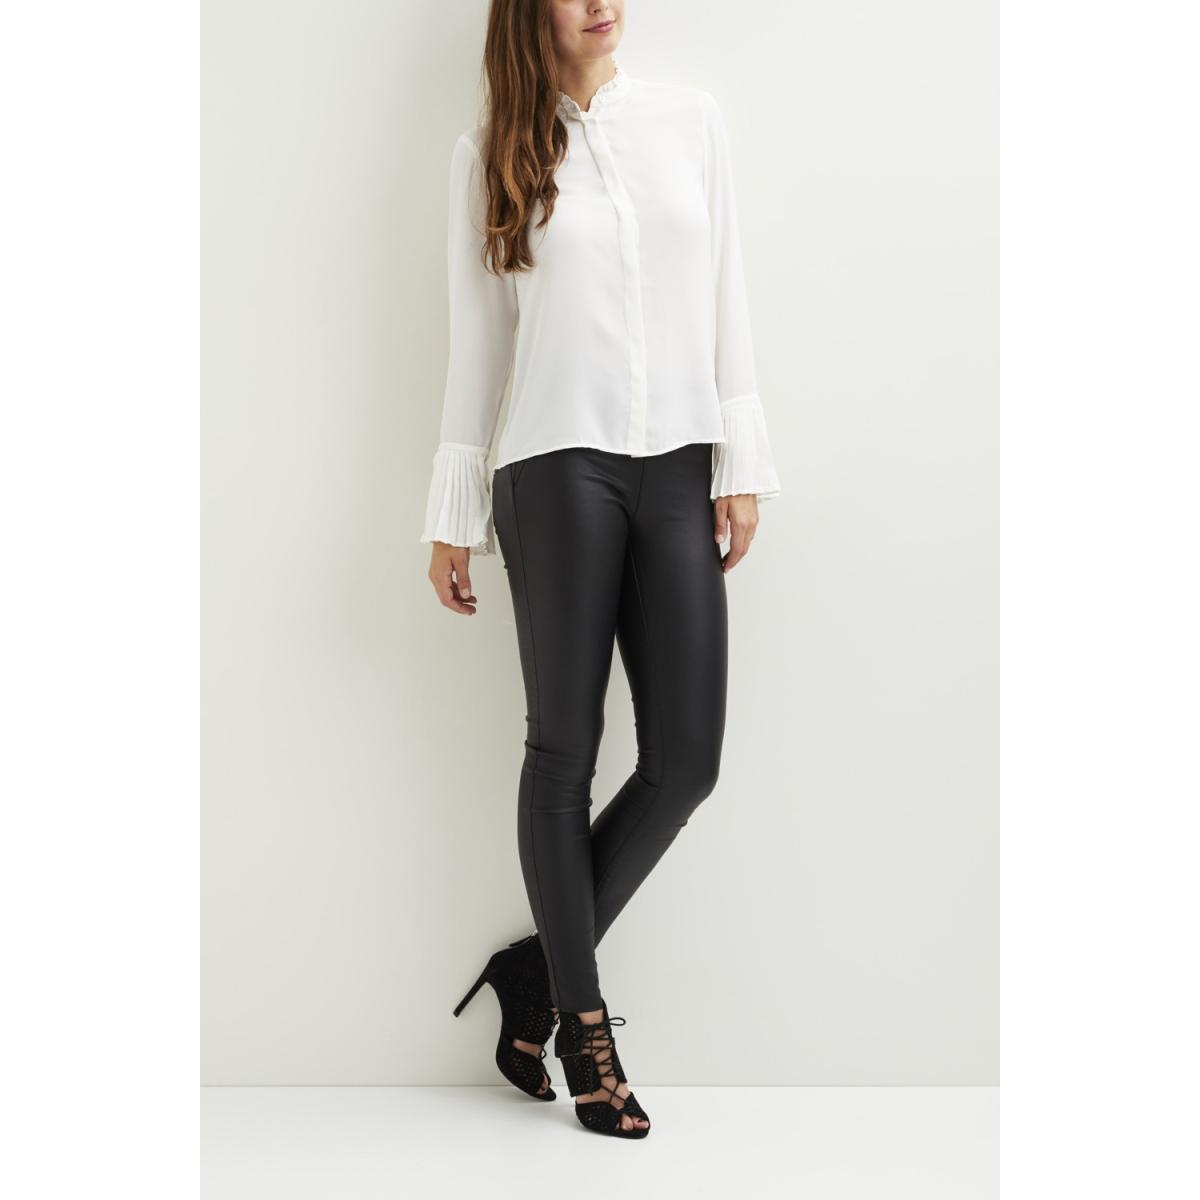 vicamila l/s shirt/gv 14044135 vila blouse cloud dancer